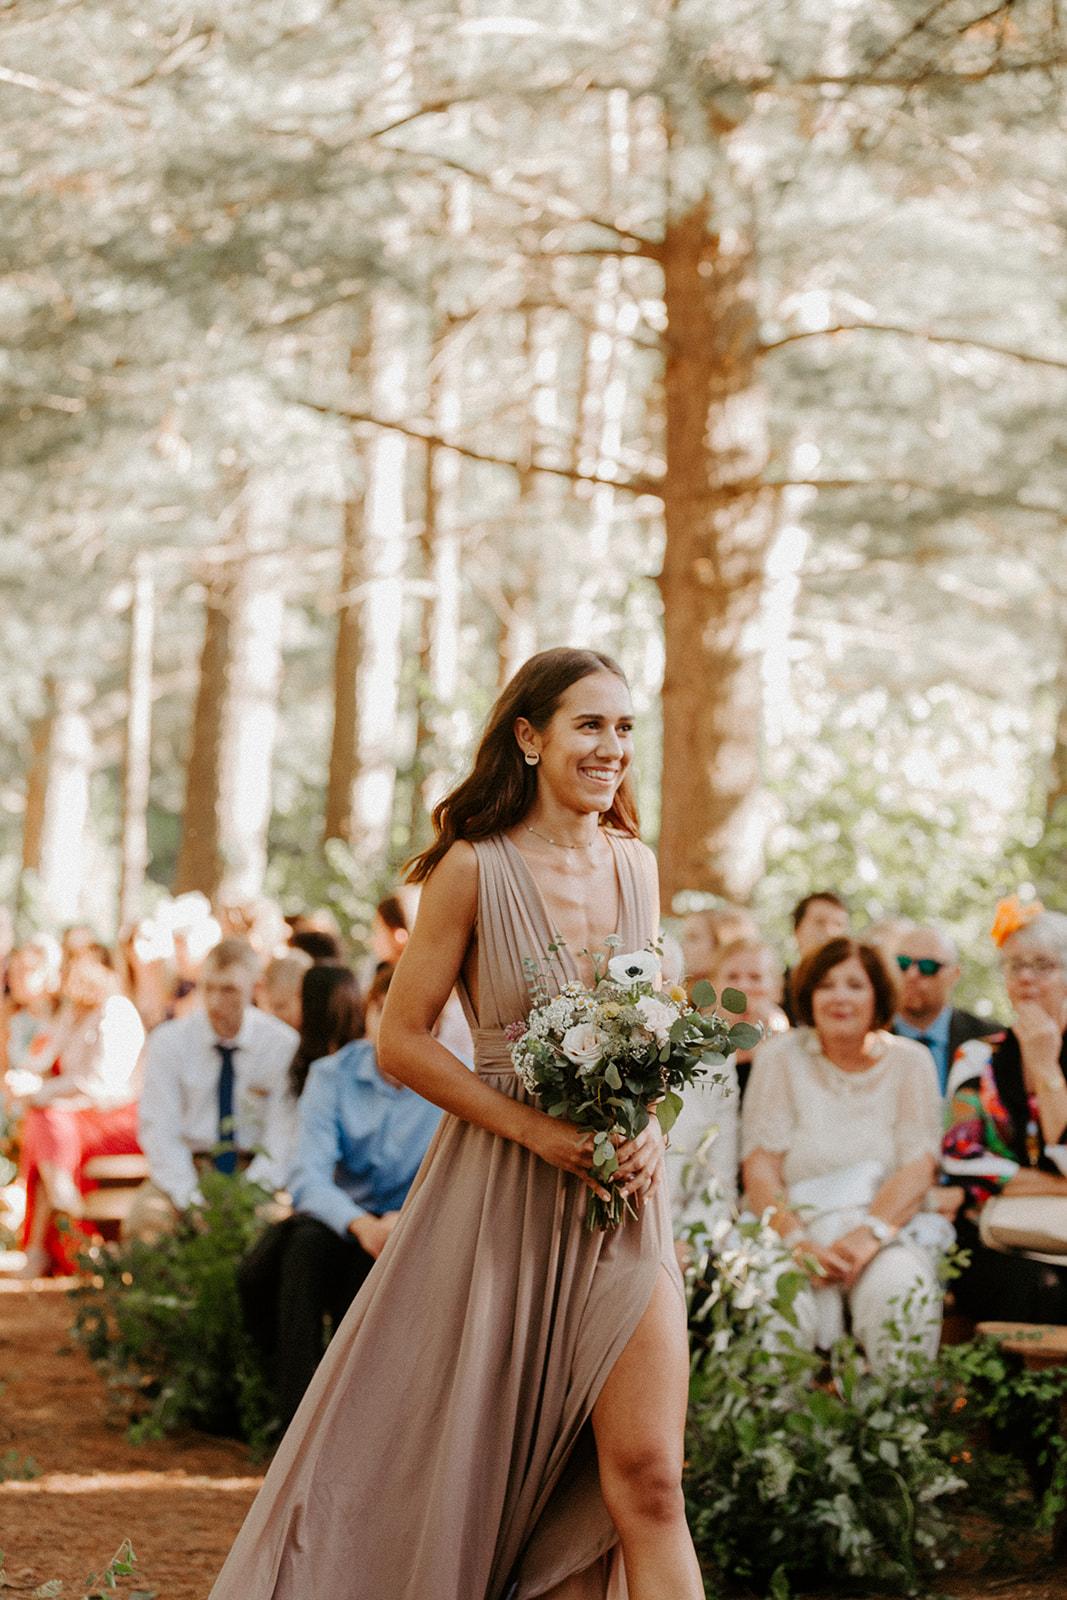 camp_wokanda_peoria_illinois_wedding_photographer_wright_photographs_bliese_0188.jpg